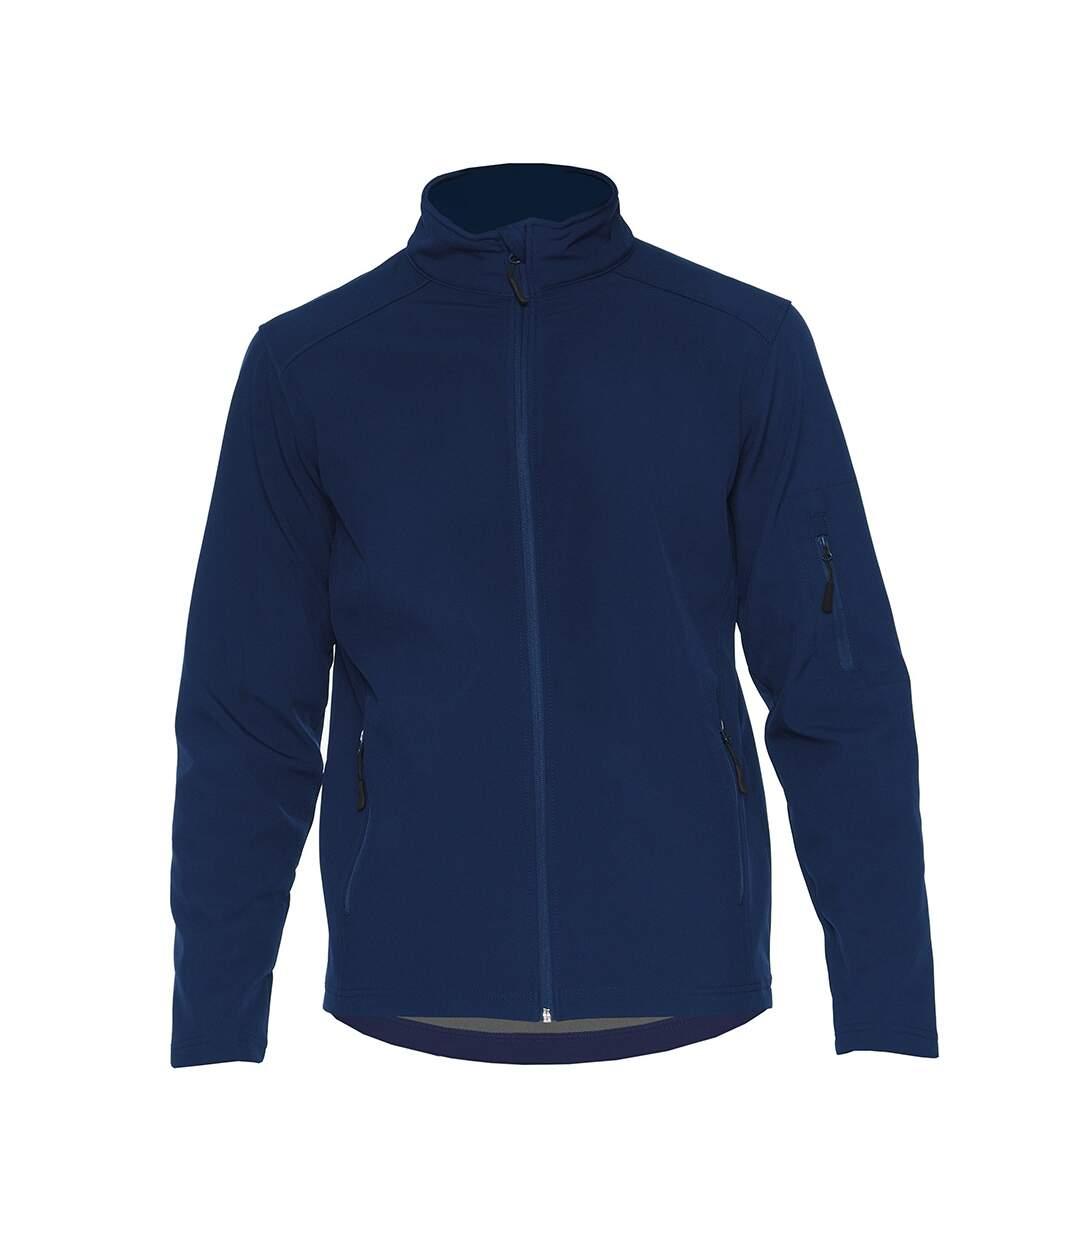 Gildan - Veste Softshell Hammer - Homme (Bleu marine) - UTPC3990